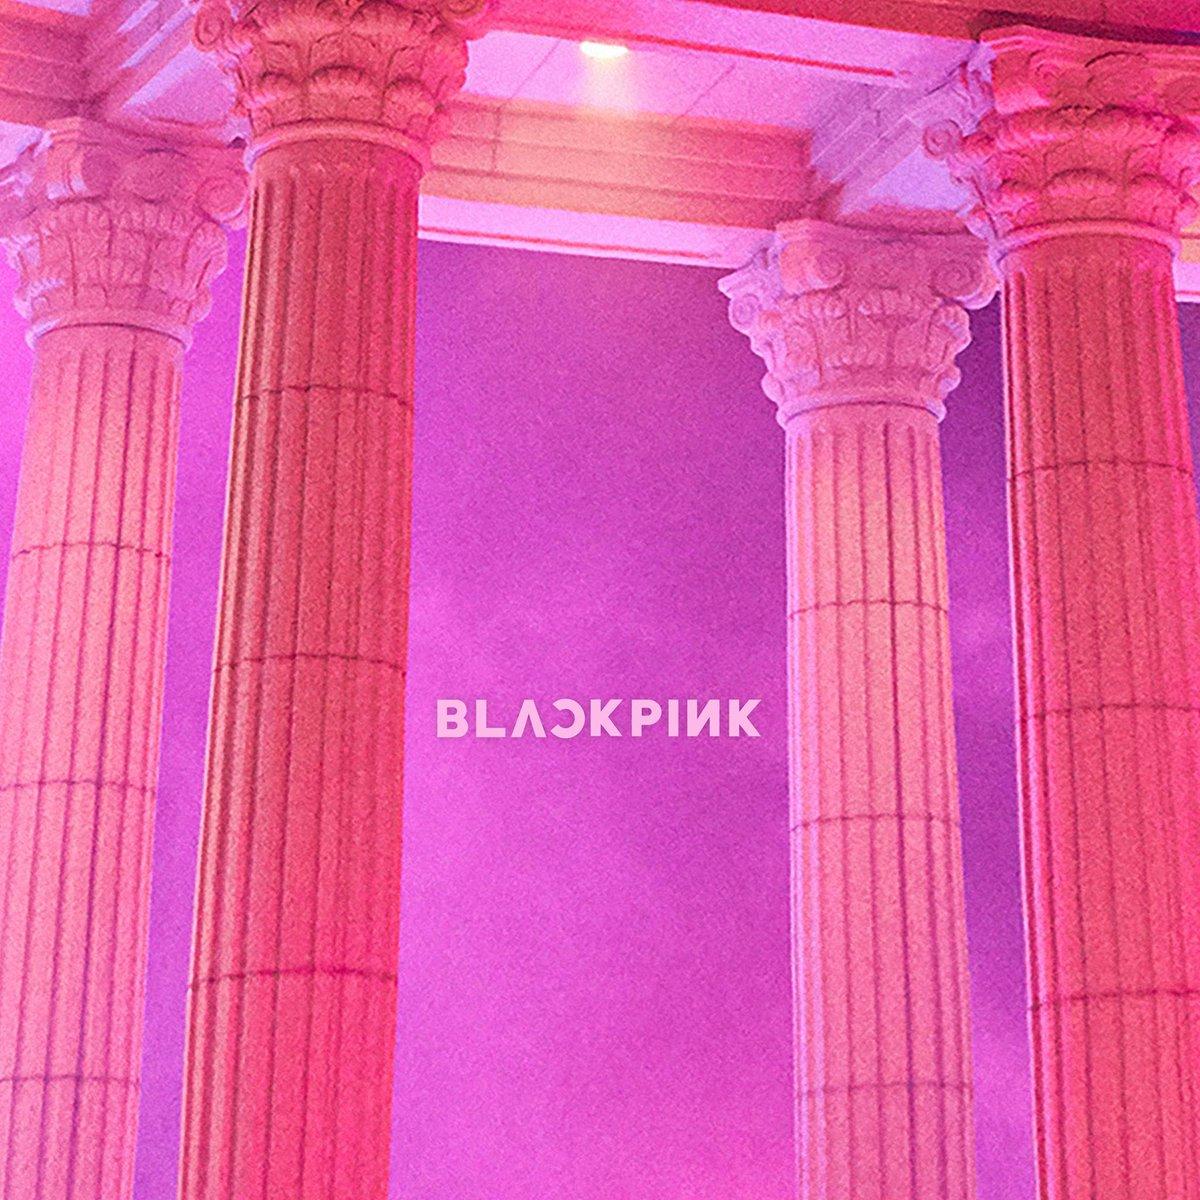 [BLACKPINK - 'AS IF IT'S YOUR LAST' FAN-SIGNING EVENT] More info @ https://t.co/66hdh37fi6 #BLACKPINK #블랙핑크 #마지막처럼 #ASIFITSYOURLAST #YG